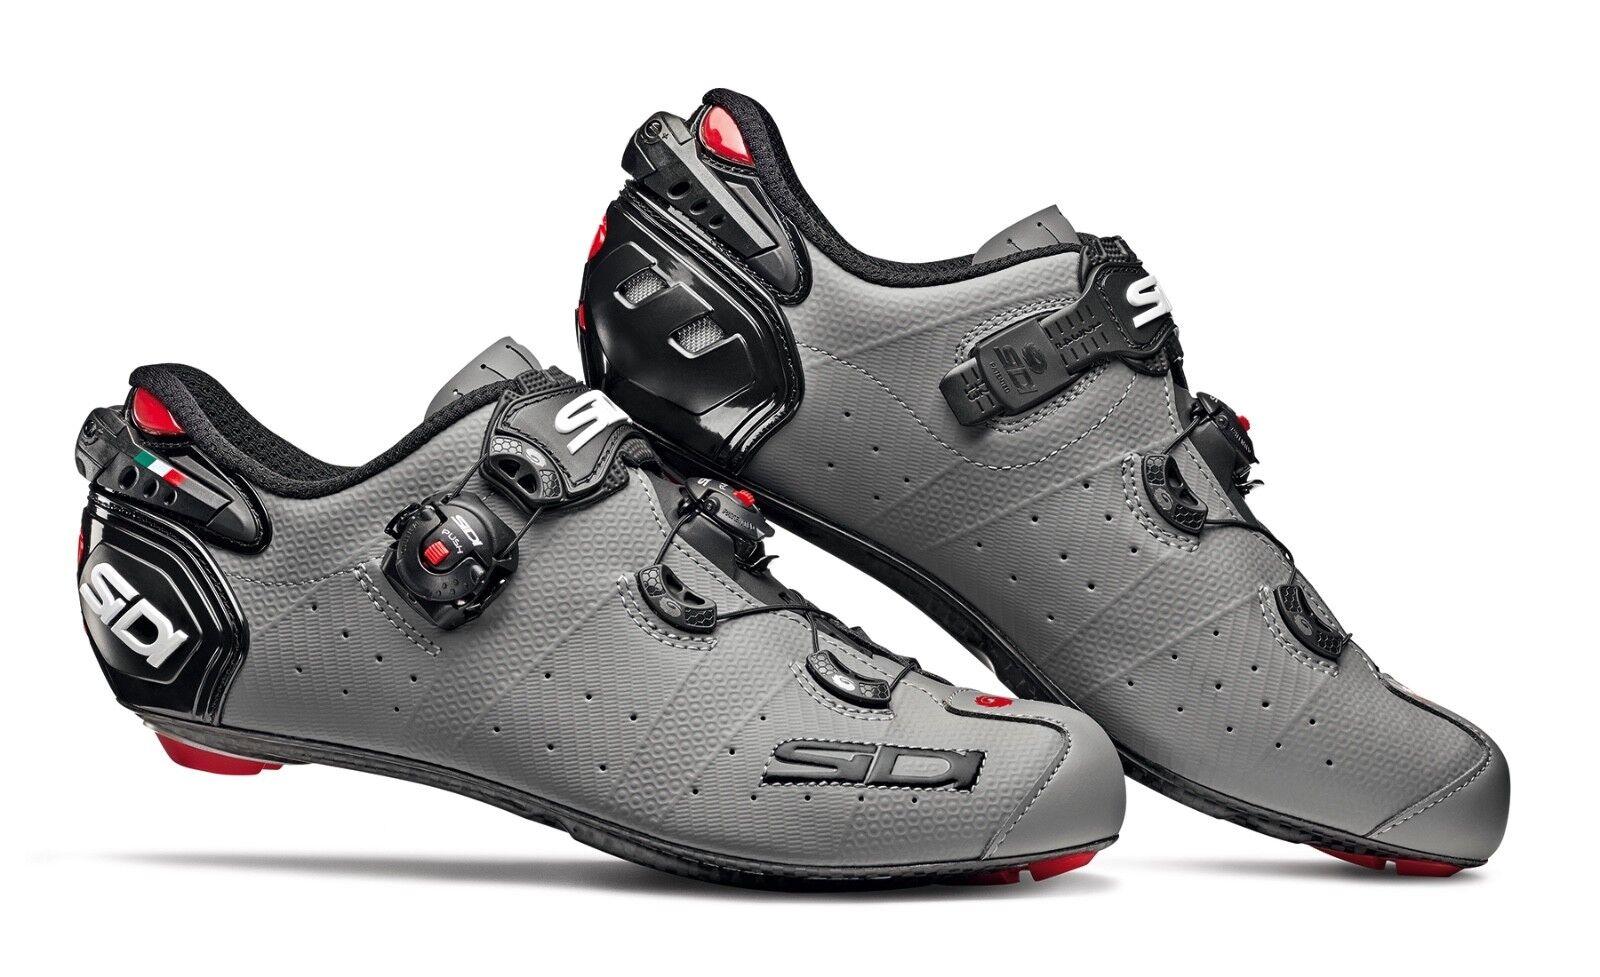 Schuhe SIDI SIDI SIDI WIRE 2 matt Kohlenstoff Größe 45,5 grau matt schwarz 6b2e62